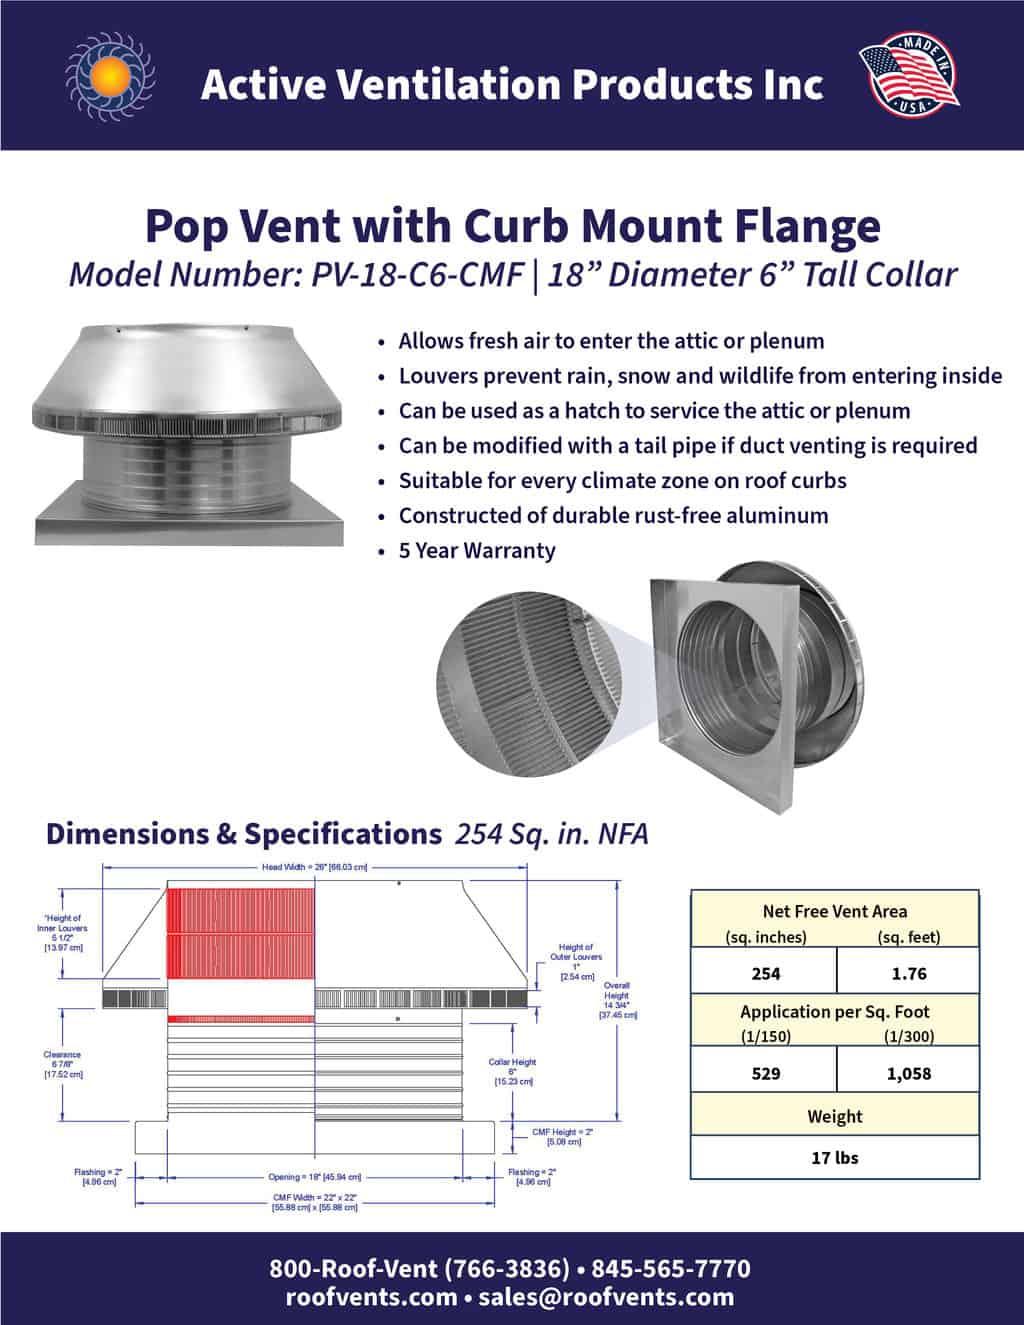 PV-18-C6-CMF-brochure